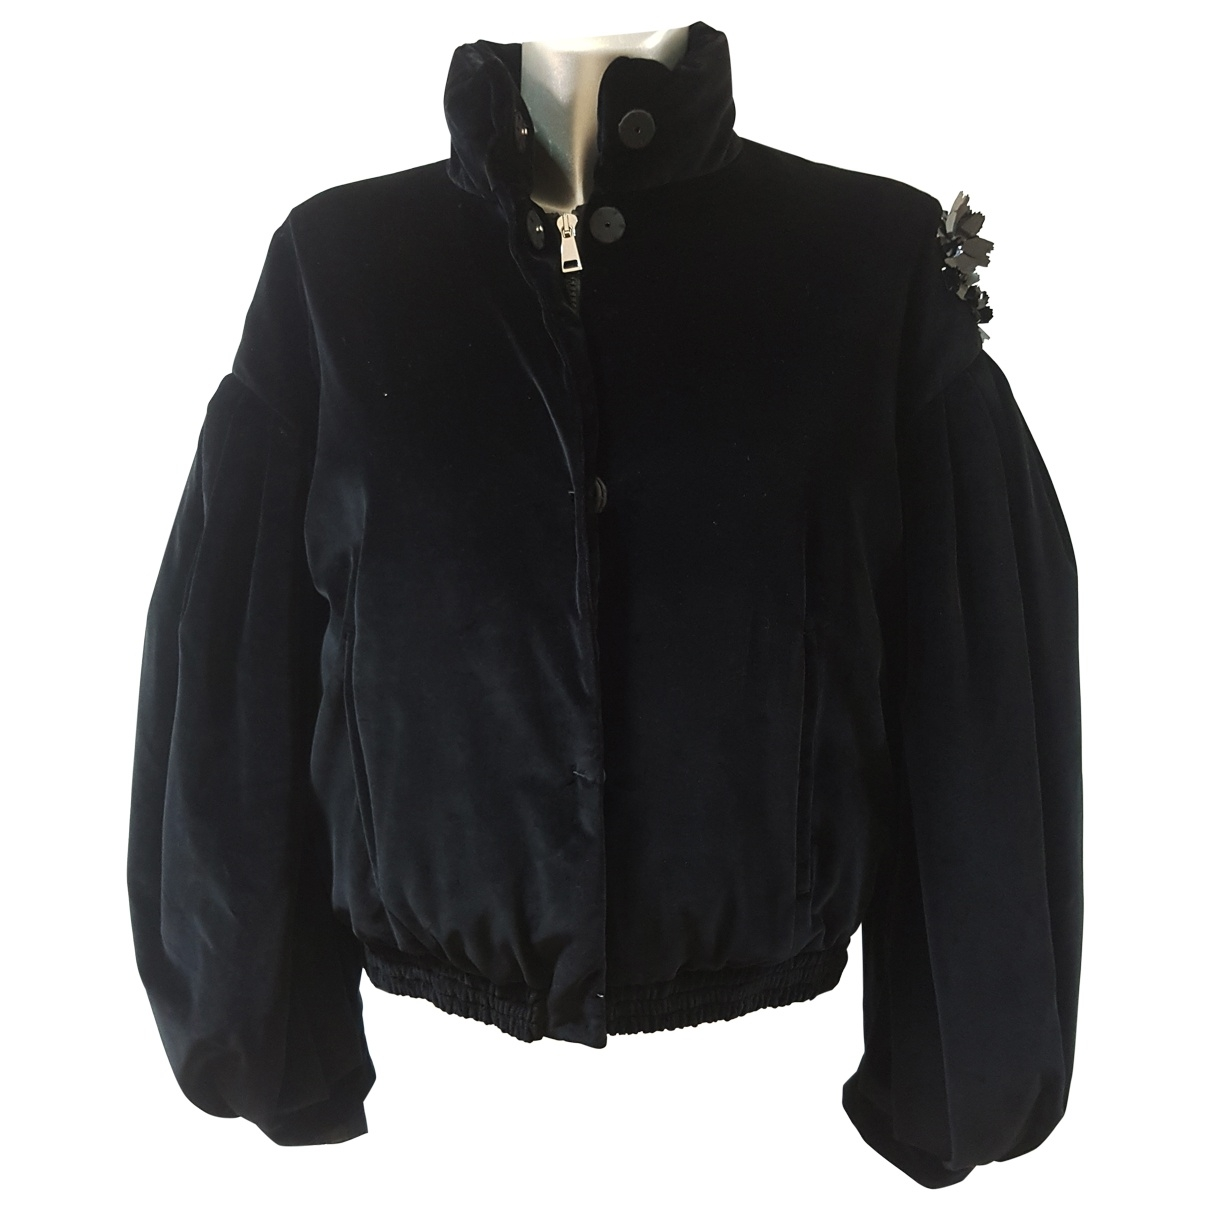 Moncler Genius \N Black Cotton jacket for Women 1 US